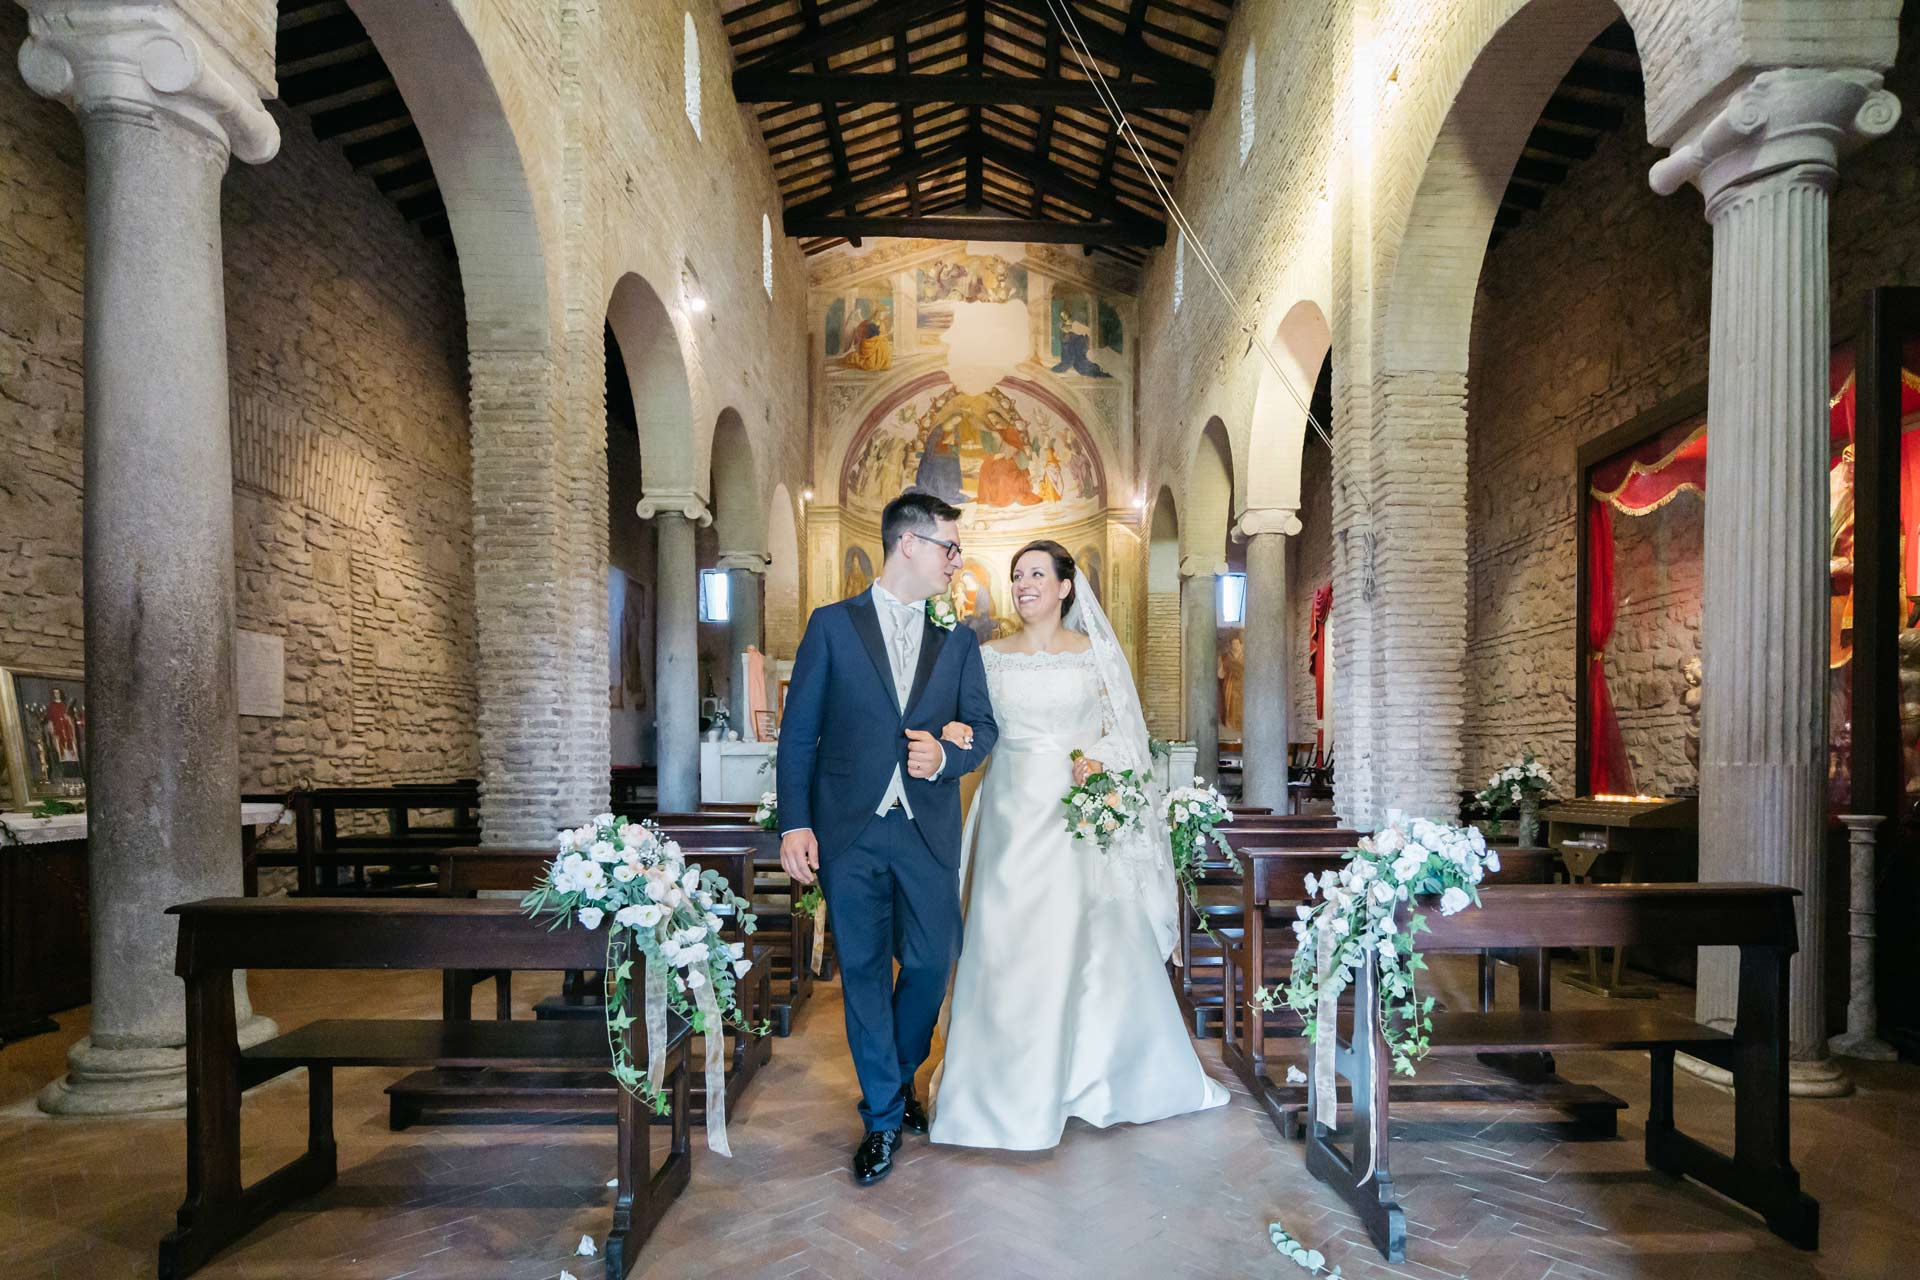 fotografo-matrimoni-reportage-sant'antimo-simone-nunzi